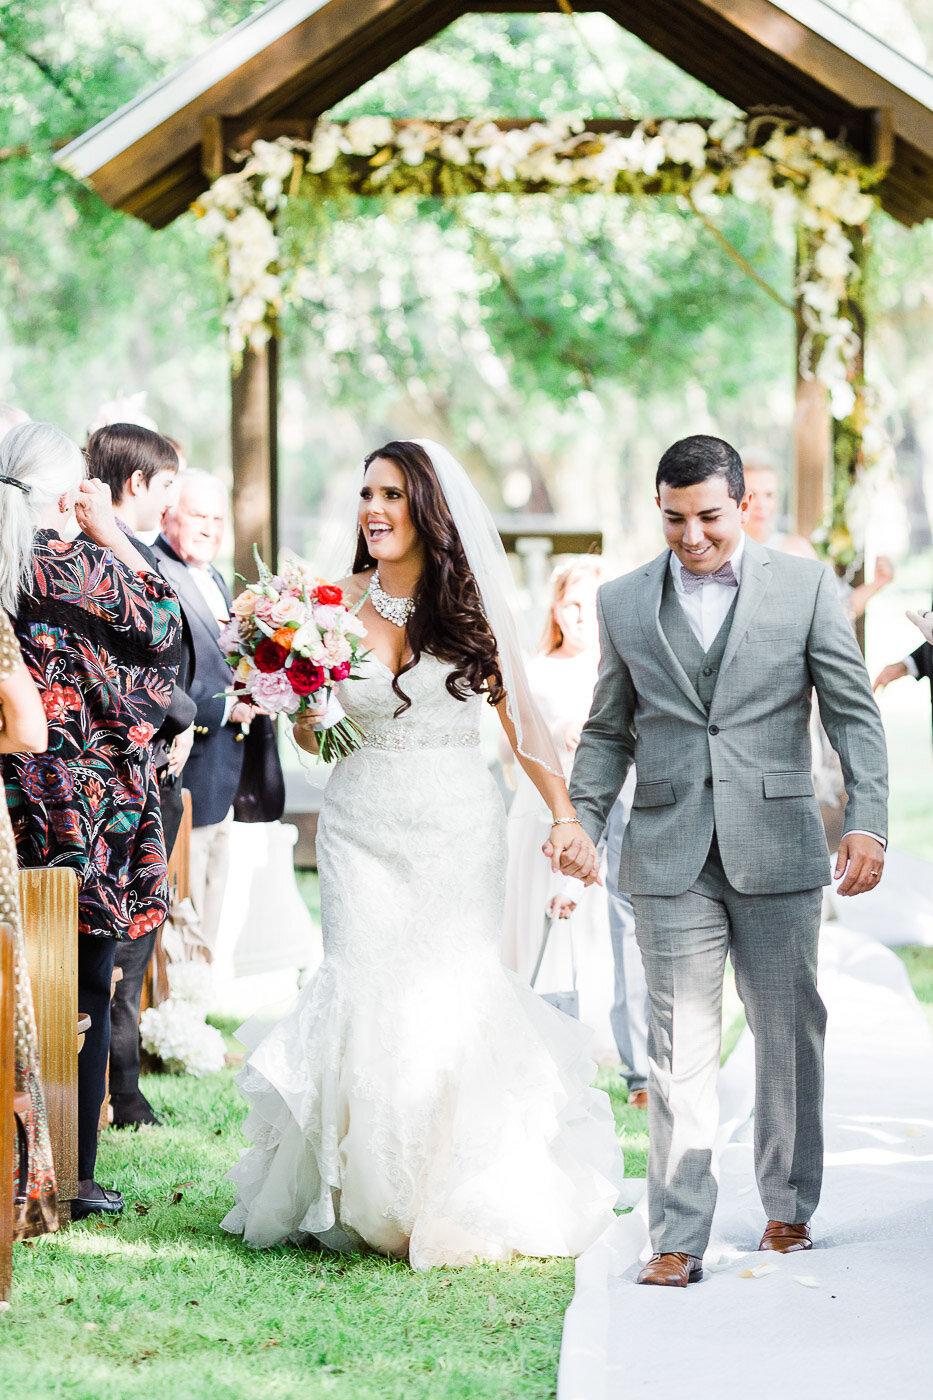 Lakeland-barn-wedding-at-white-horse-ranch-48.jpg